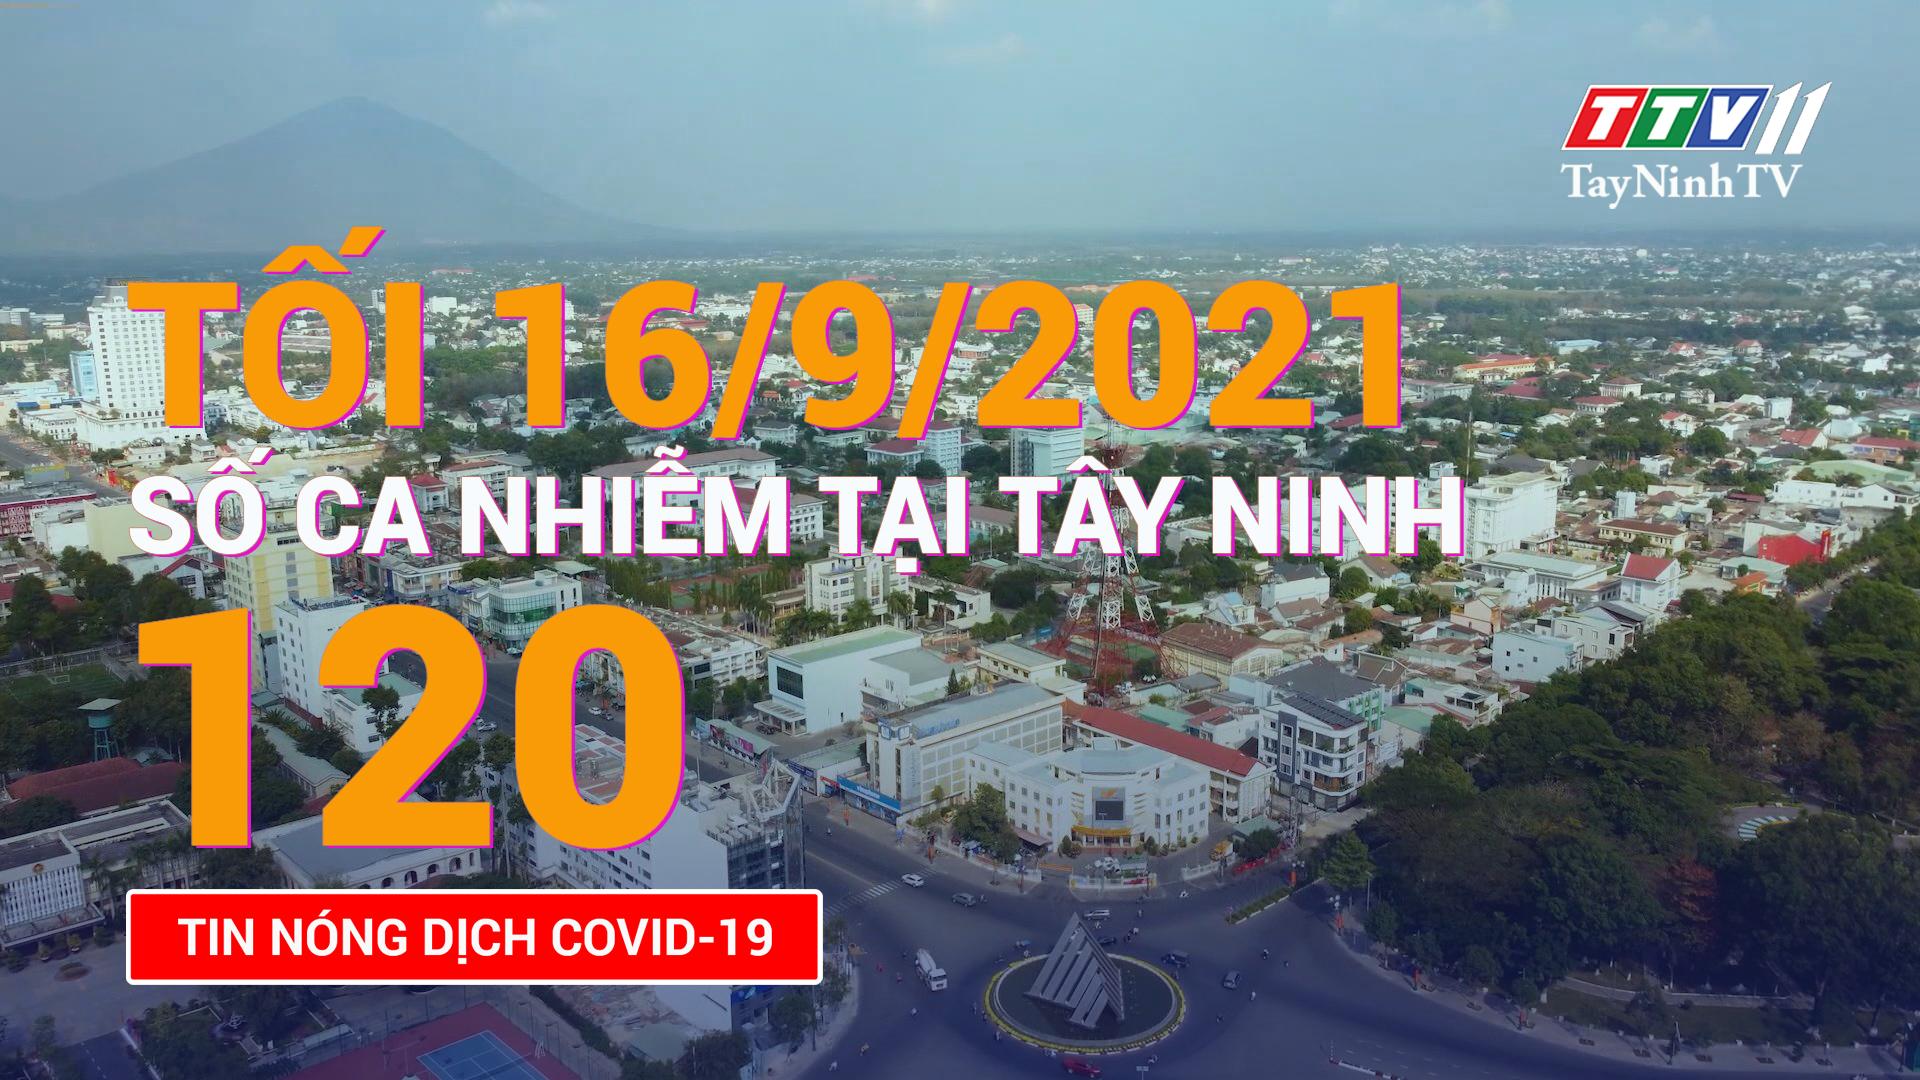 Tin tức Covid-19 tối 16/9/2021 | TayNinhTV